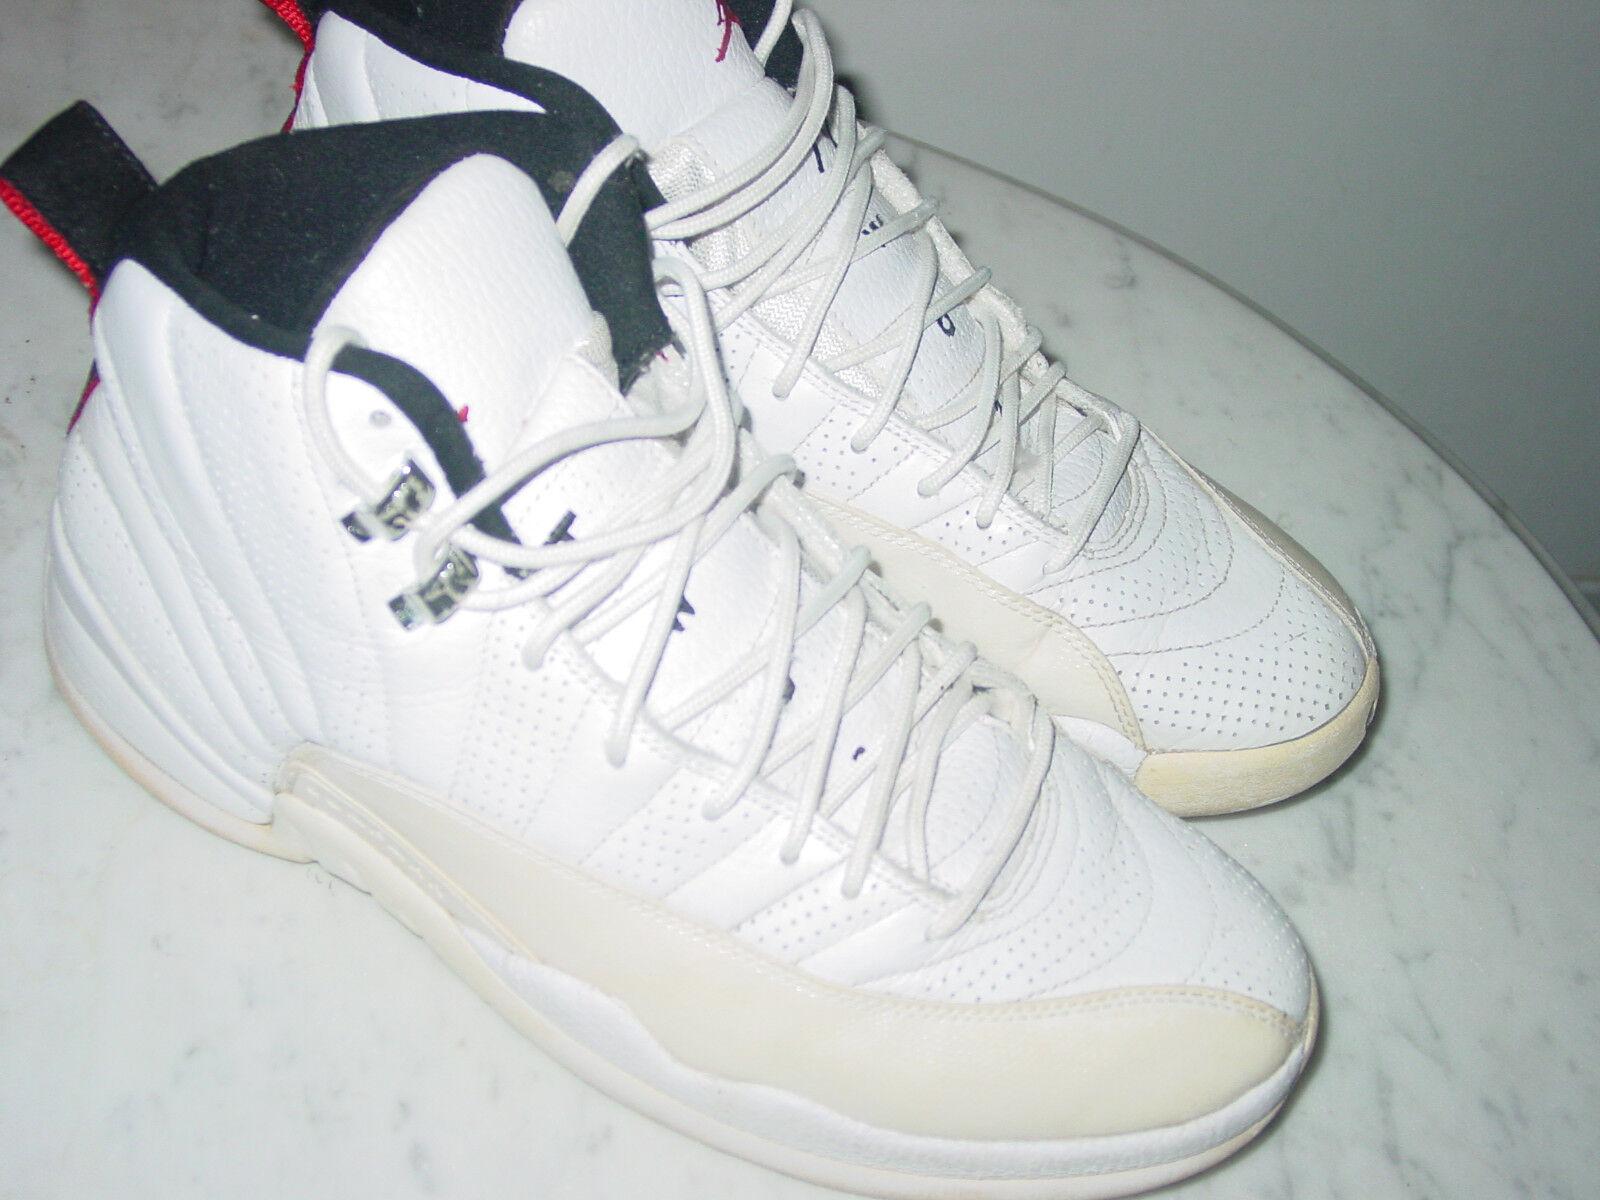 2009 Nike Air Jordan Retro 12 Rising Sun White/Black Basketball Shoe Size 10.5